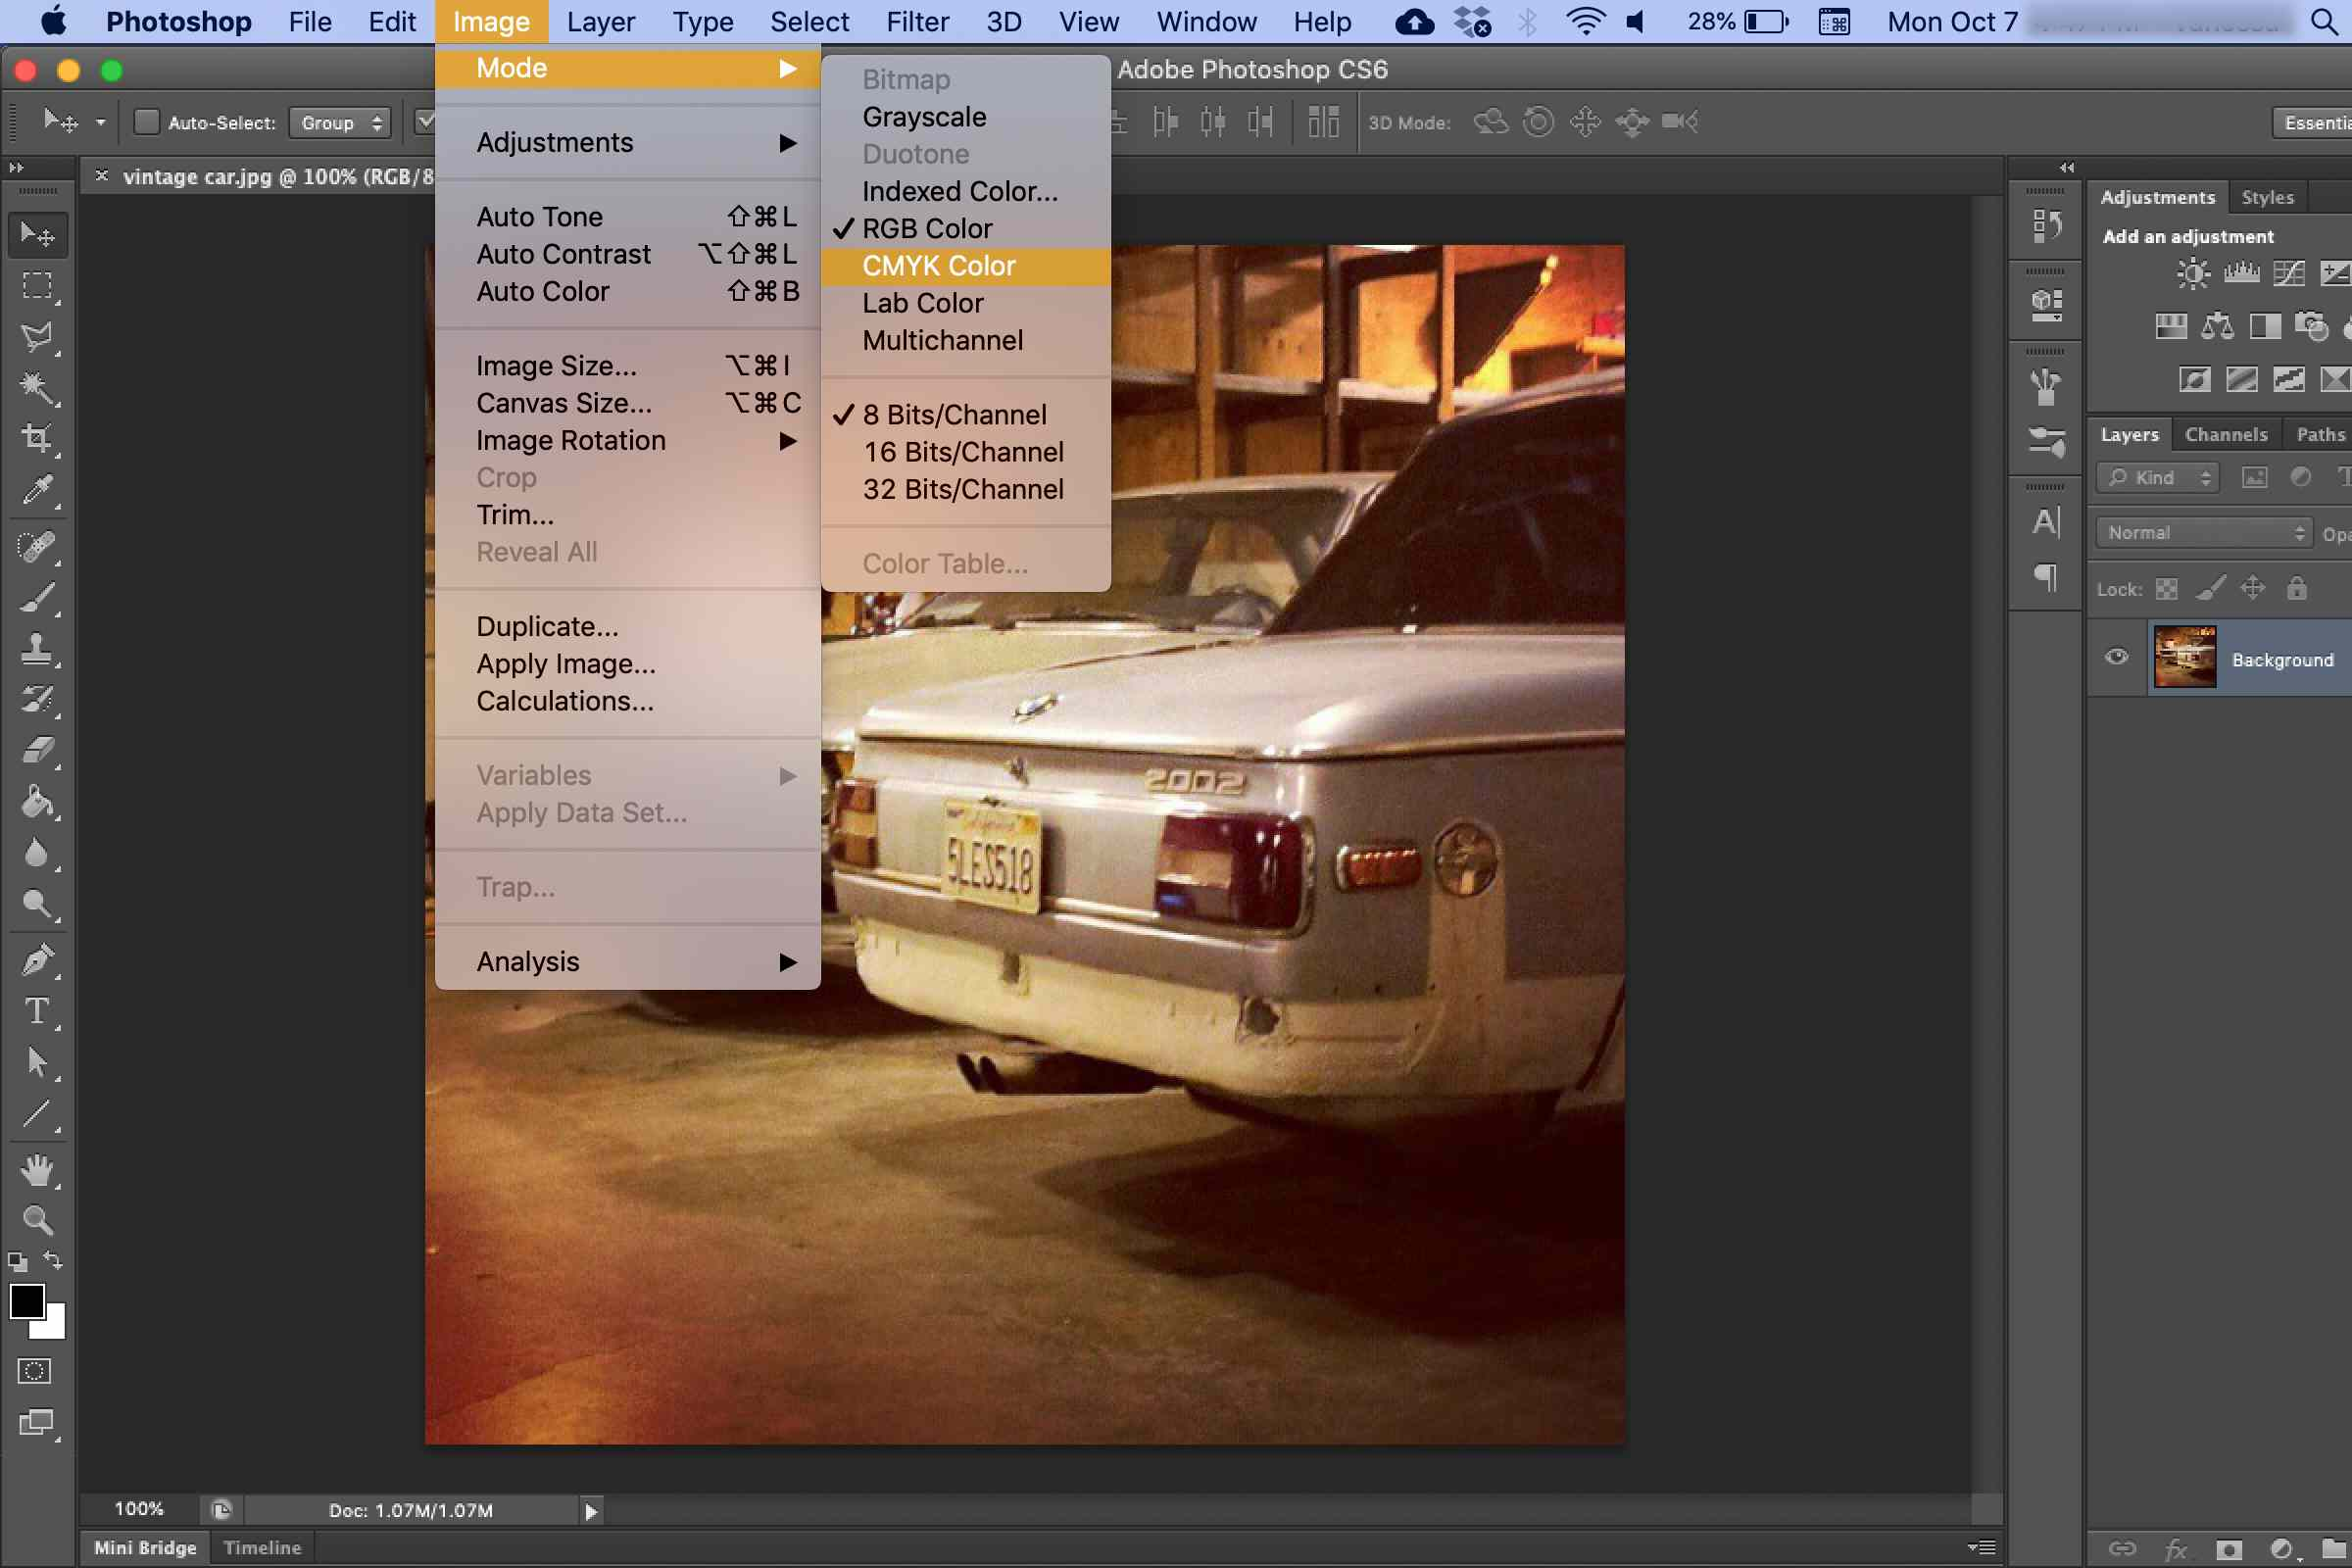 RBG CMYK conversion in Photoshop